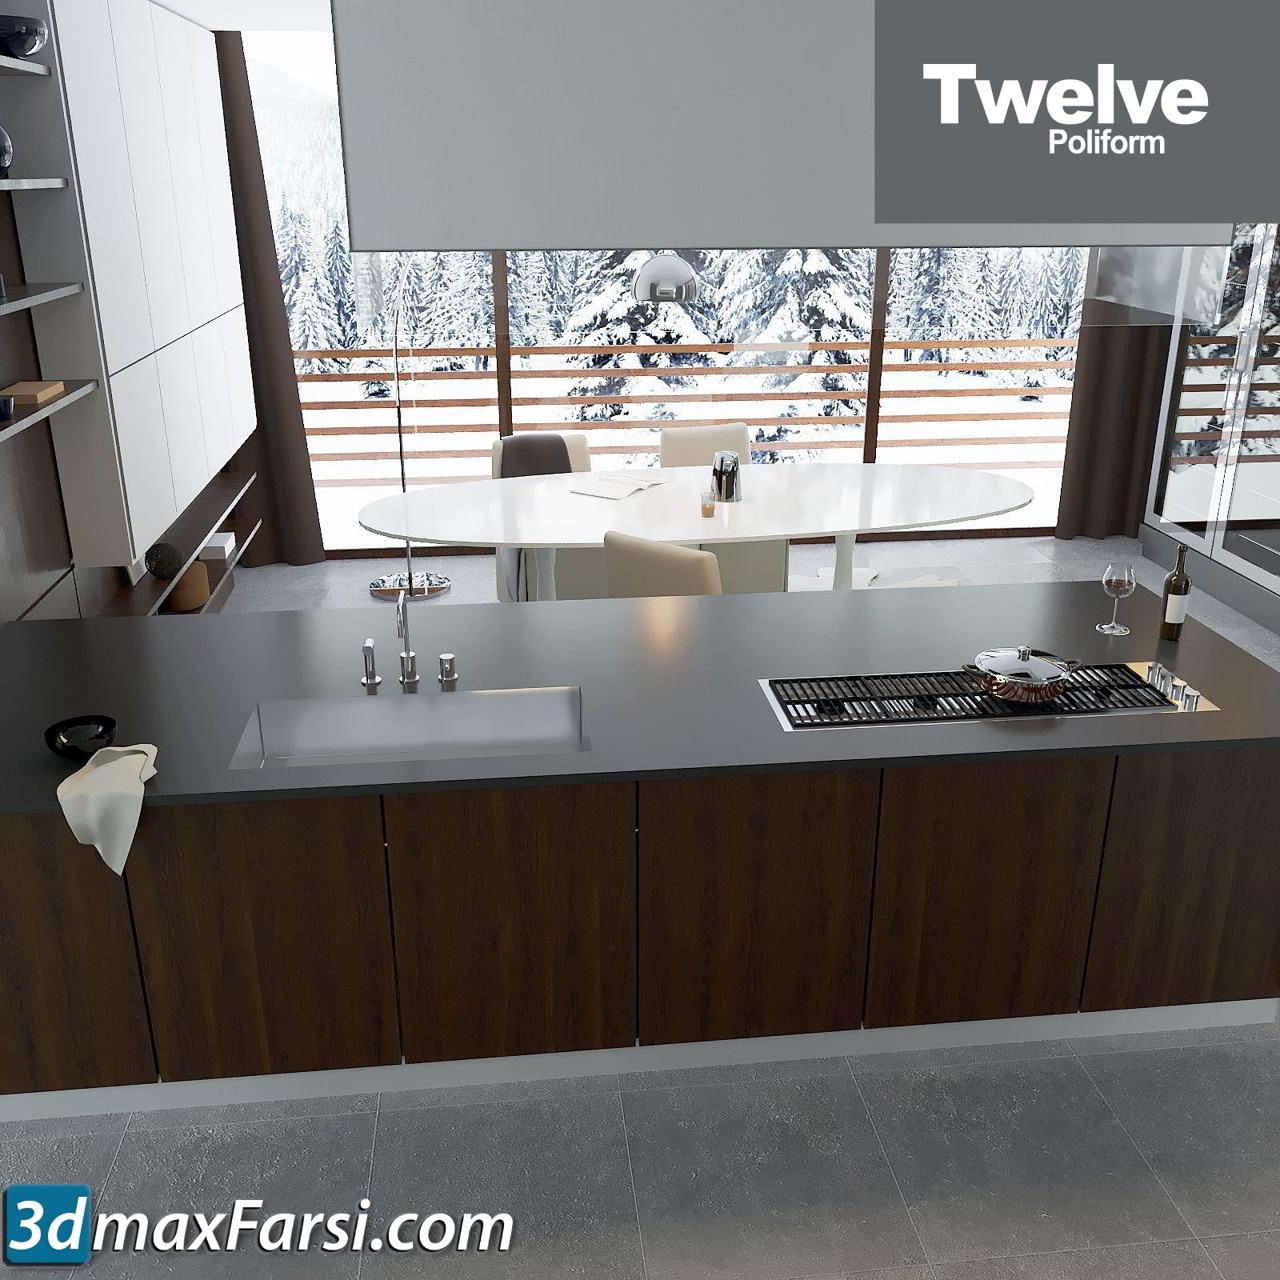 Kitchen Poliform Varenna Twelve vray corona free download